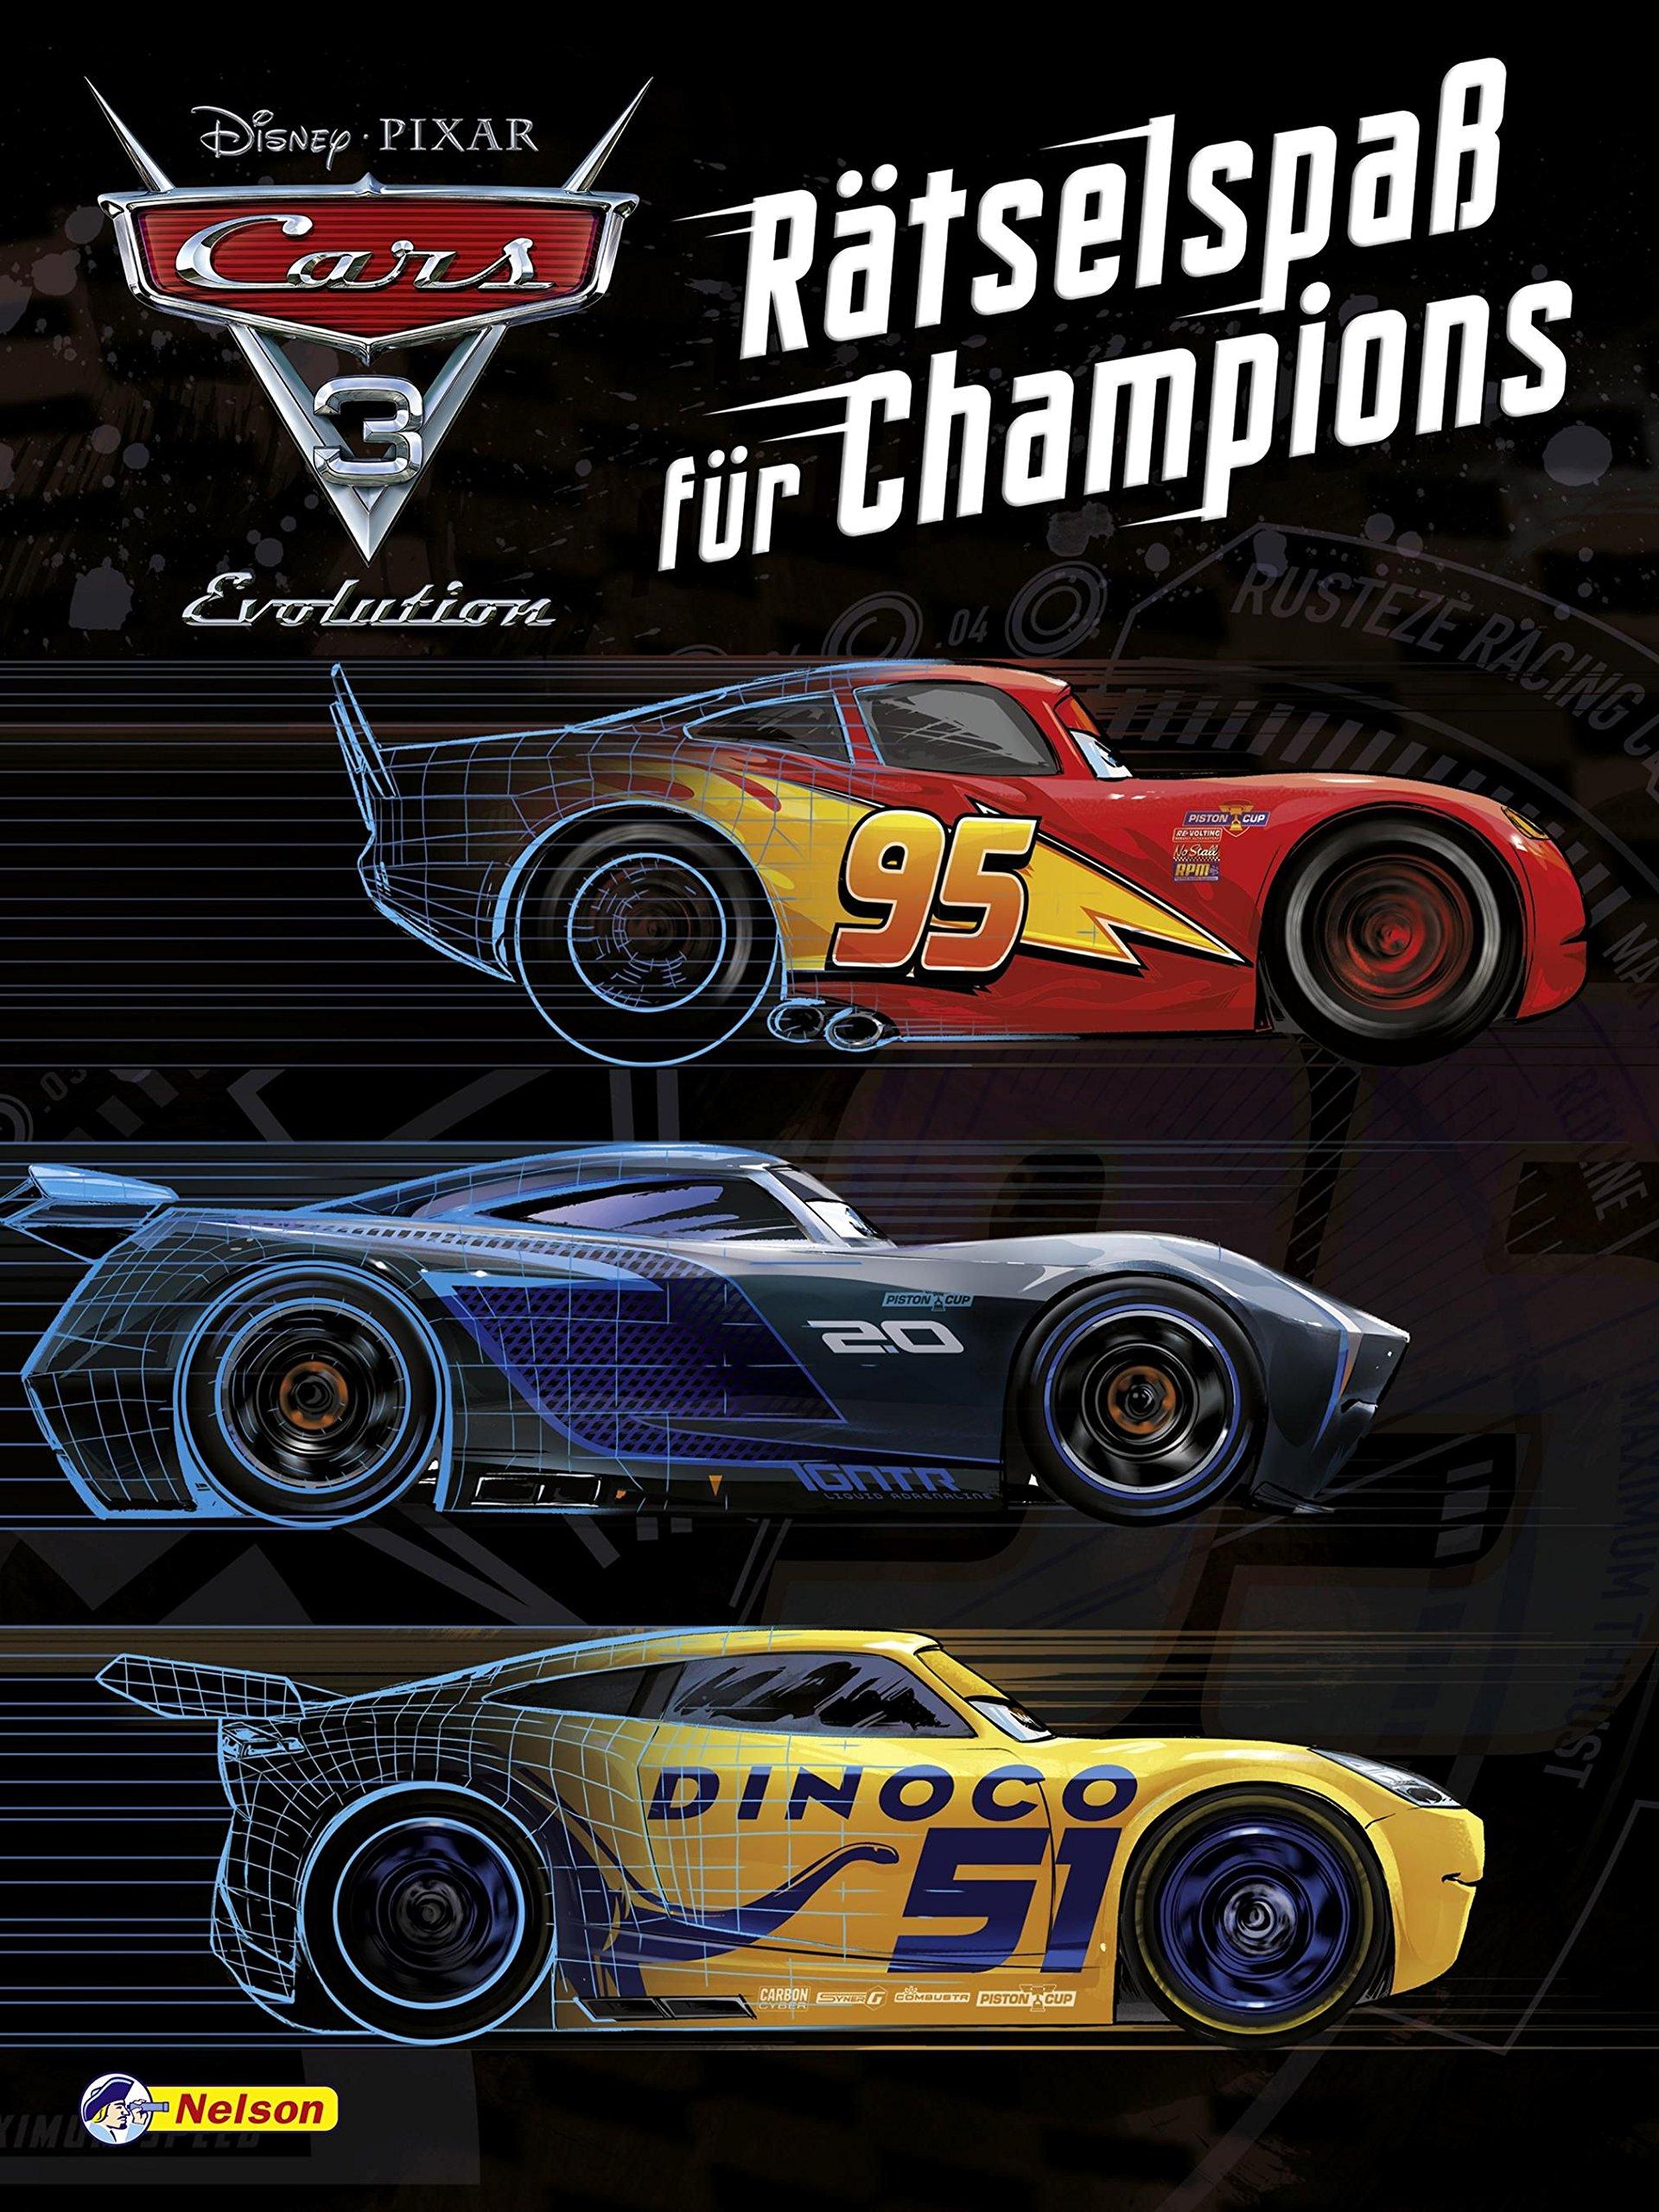 Disney Cars 3 : Rätselspaß für Champions